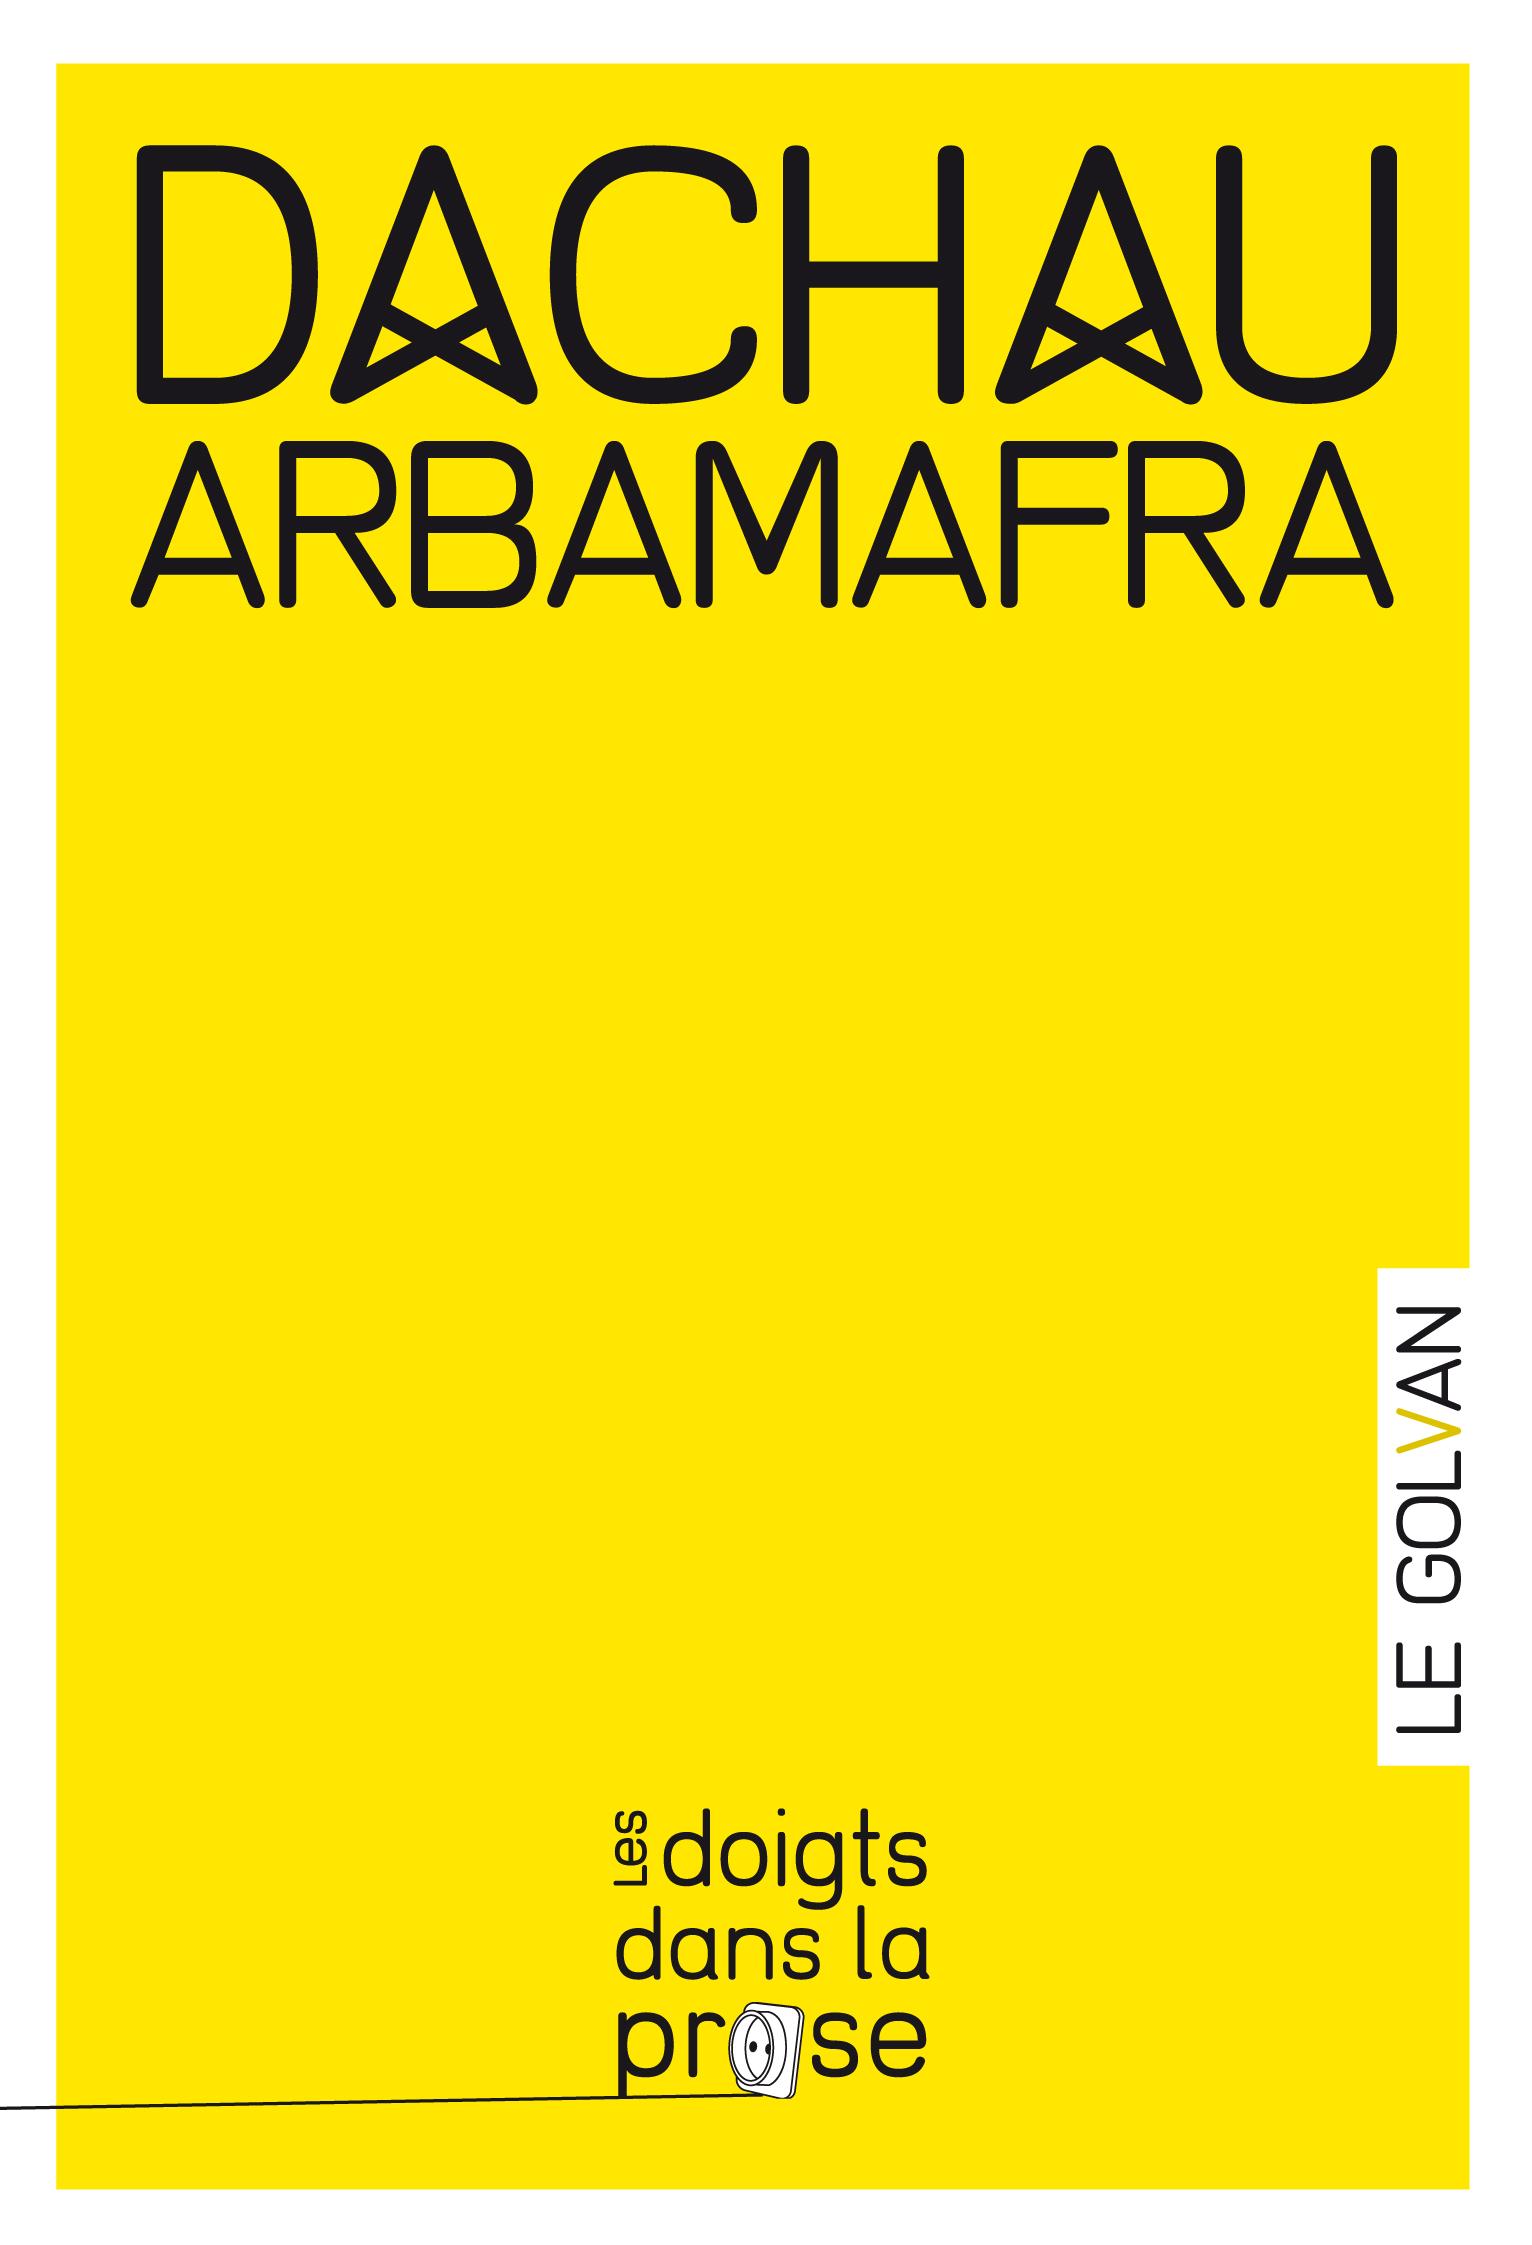 DACHAU-Arbamafra_LDDP_couv_GR